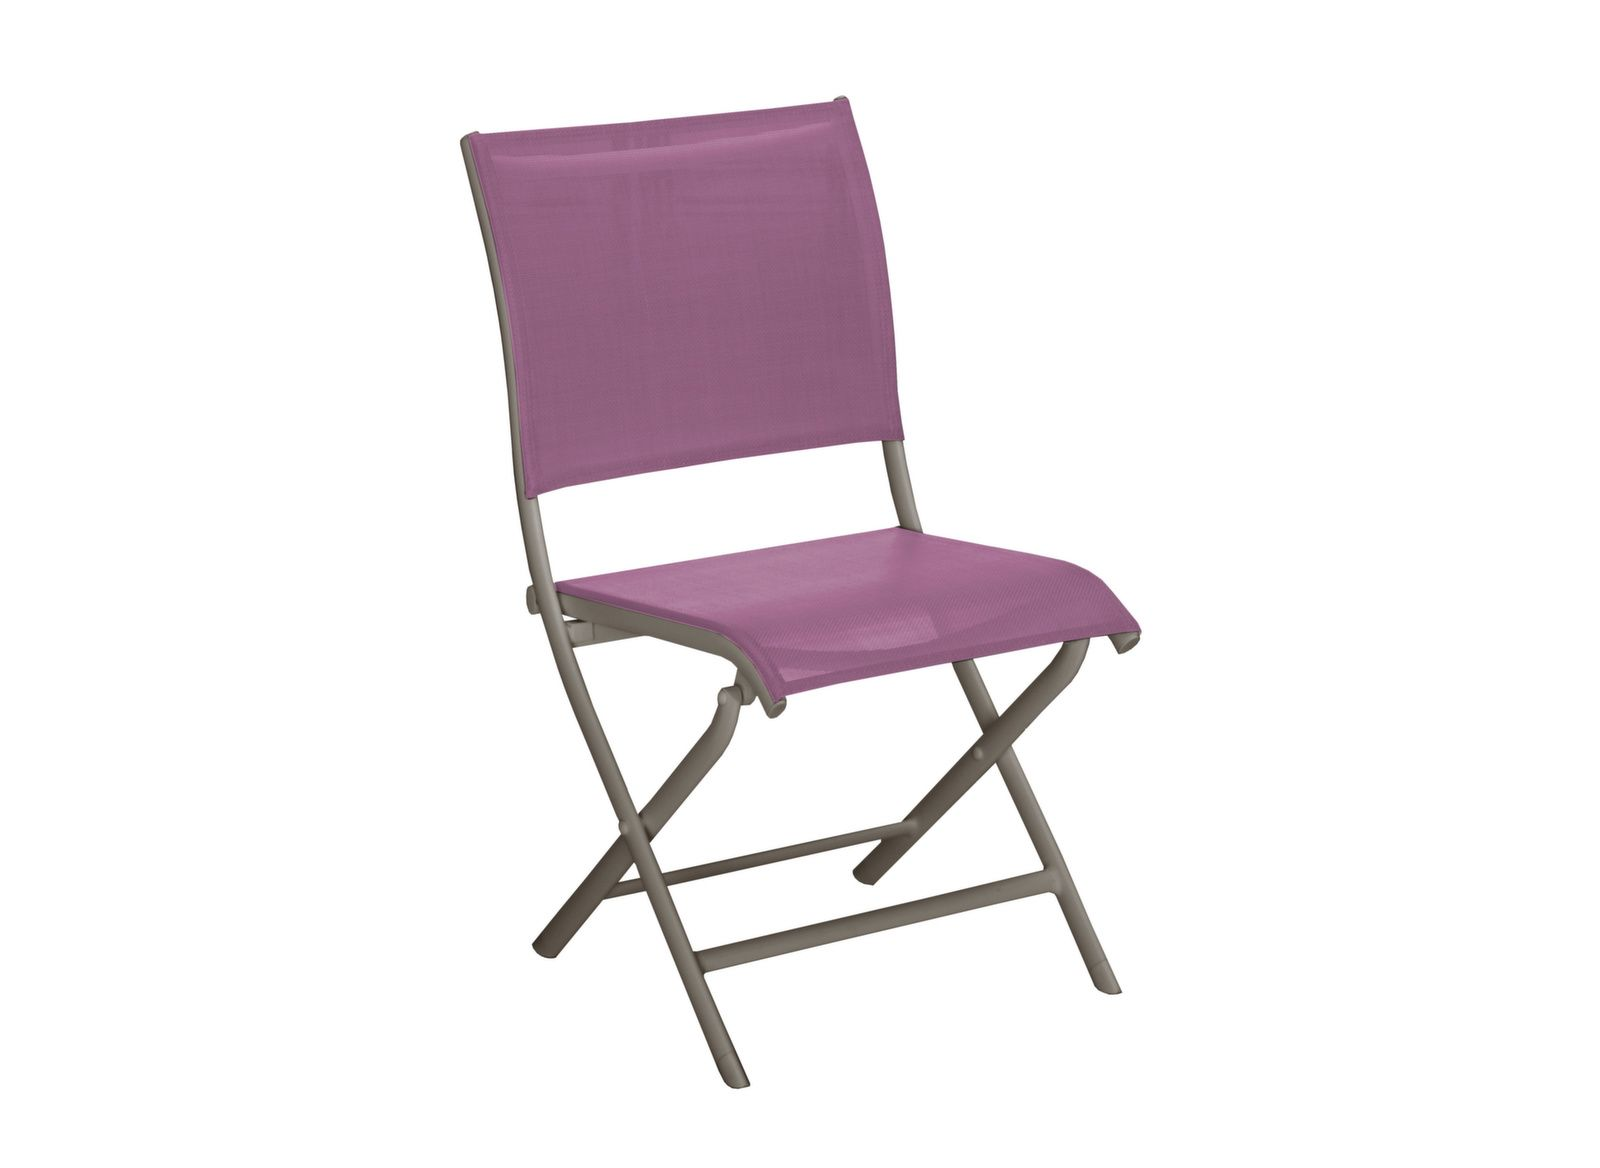 chaise pliante elegance